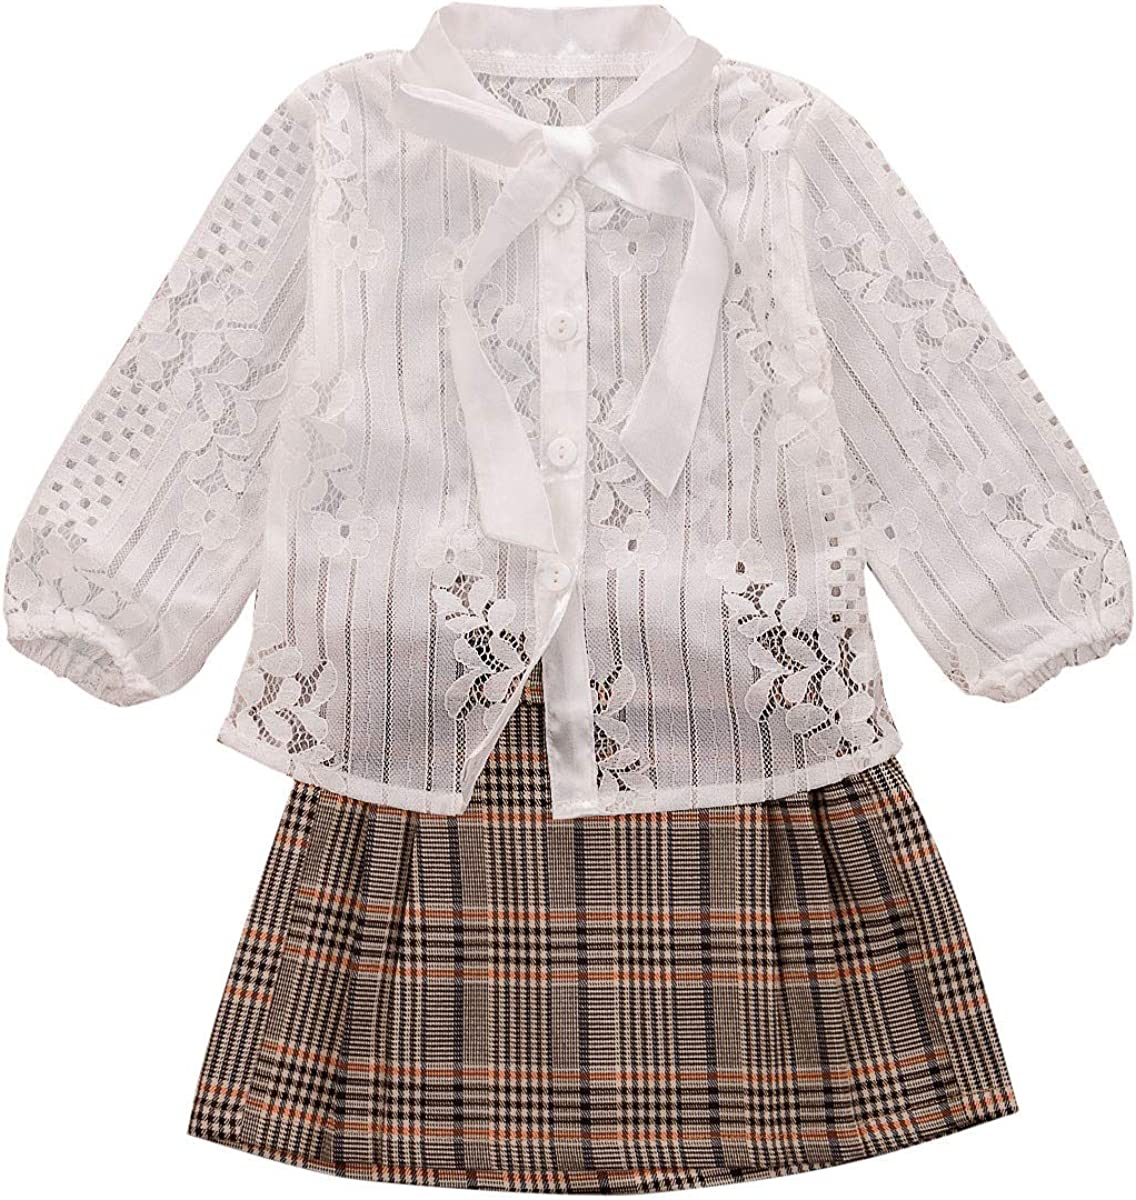 US 2PCS Toddler Baby Girl Autumn Clothes Shirt Tops+Plaids Mini Skirt Outfit Set